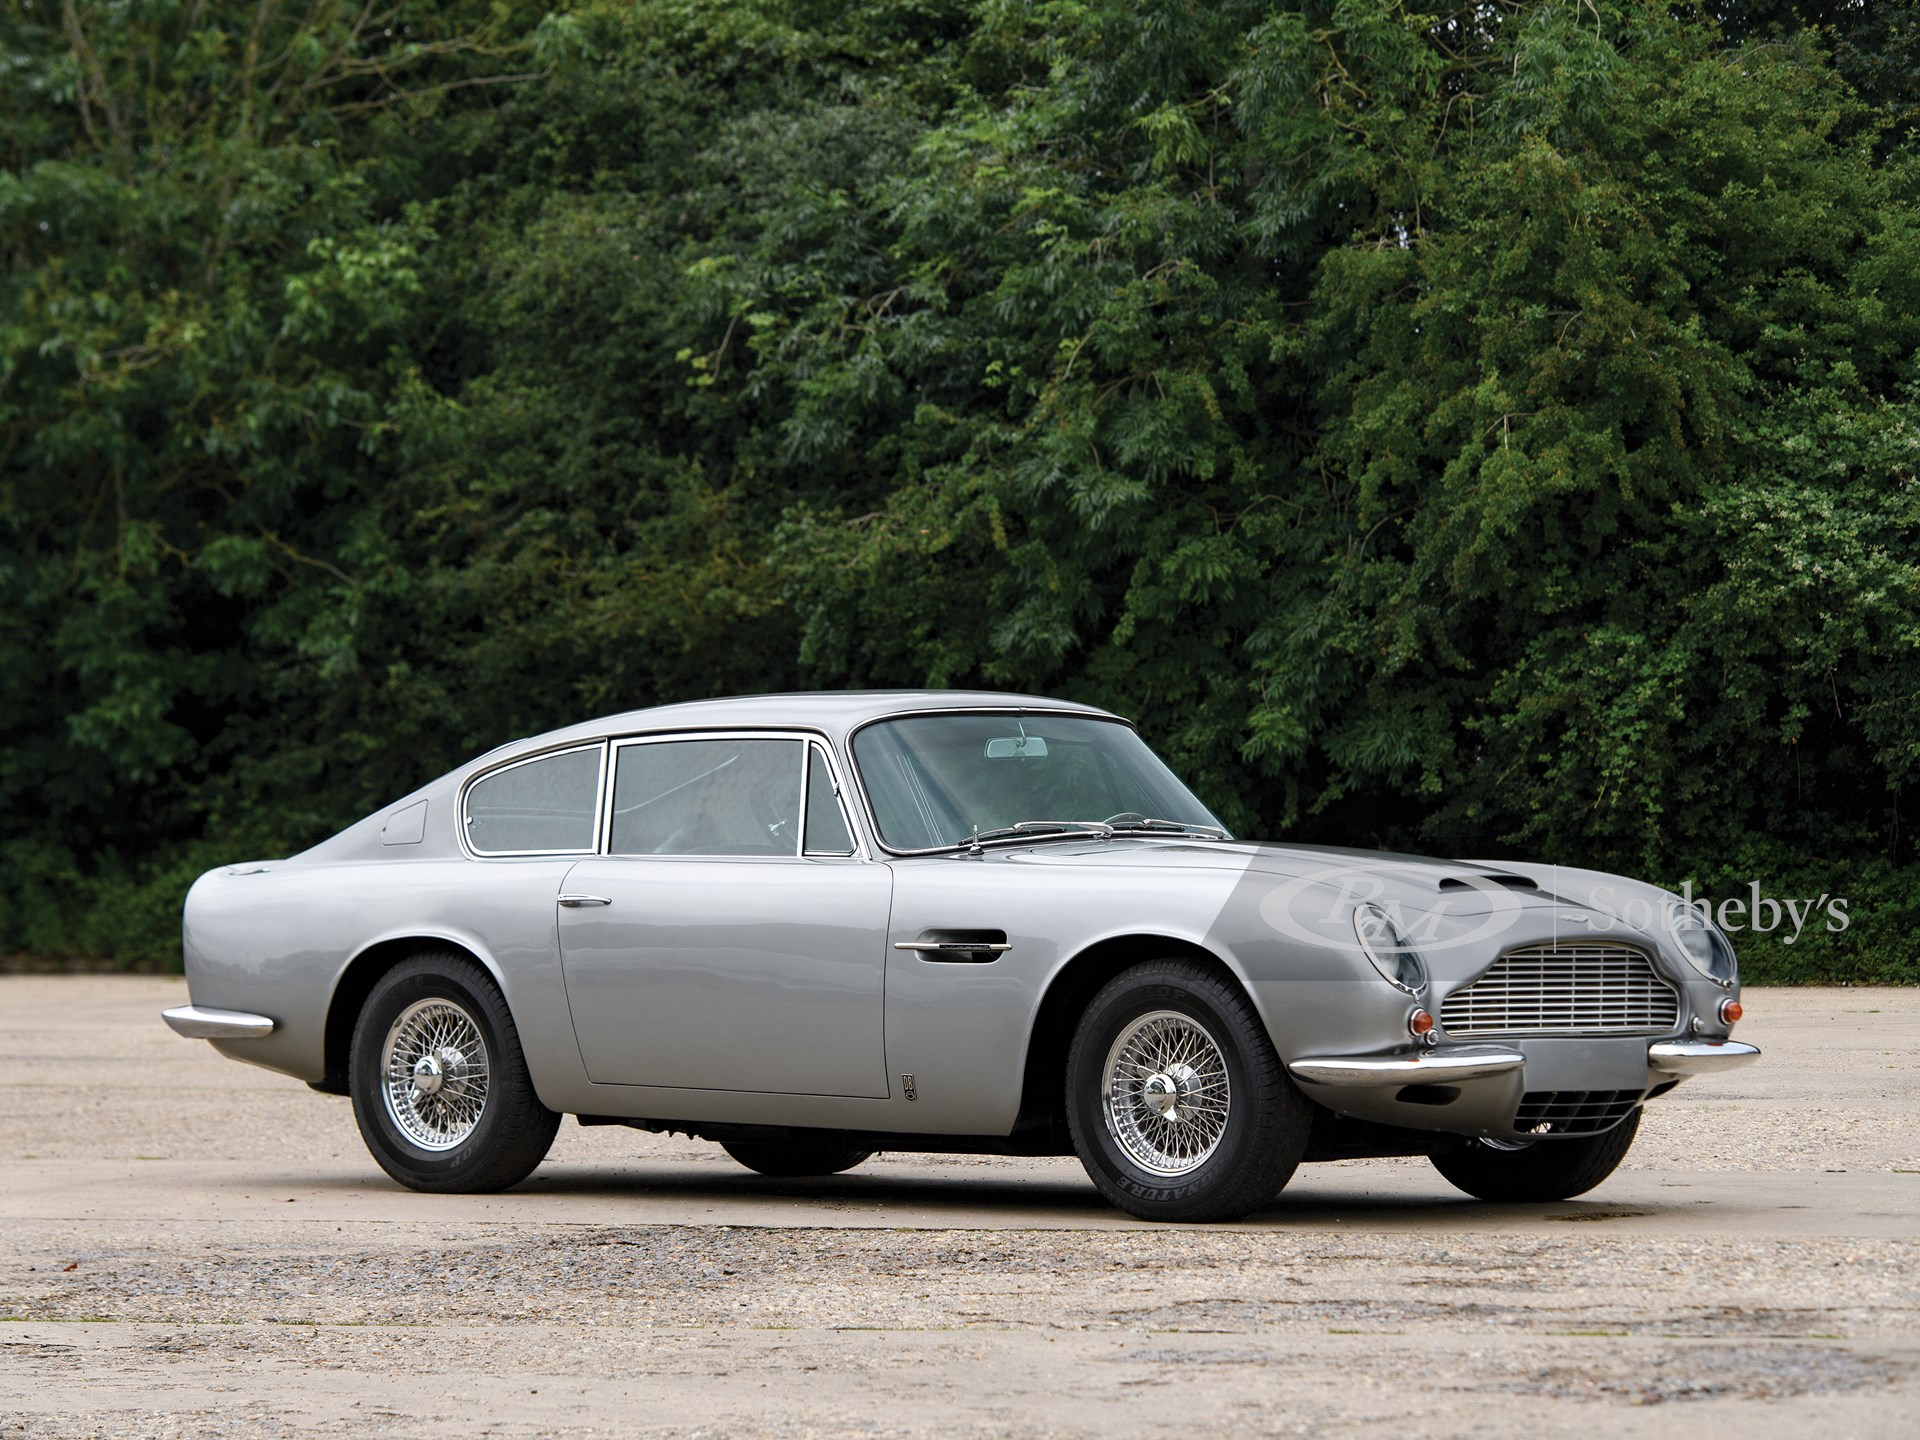 1969 Aston Martin Db6 Mk 2 Vantage Monterey 2019 Rm Sotheby S